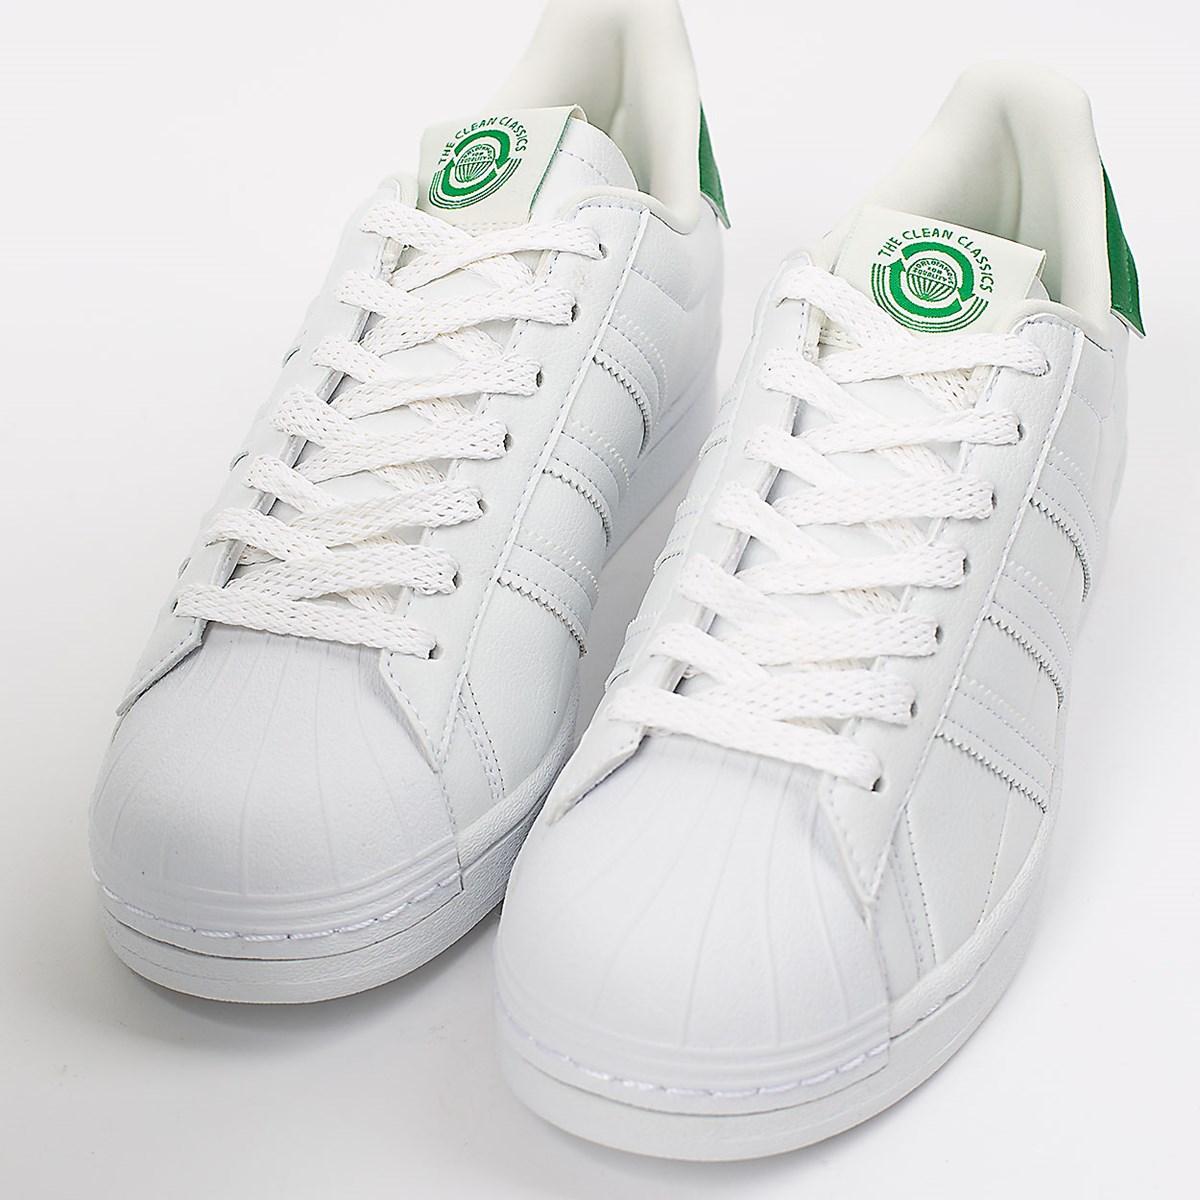 Tênis adidas Superstar Vegan White Green FY5480